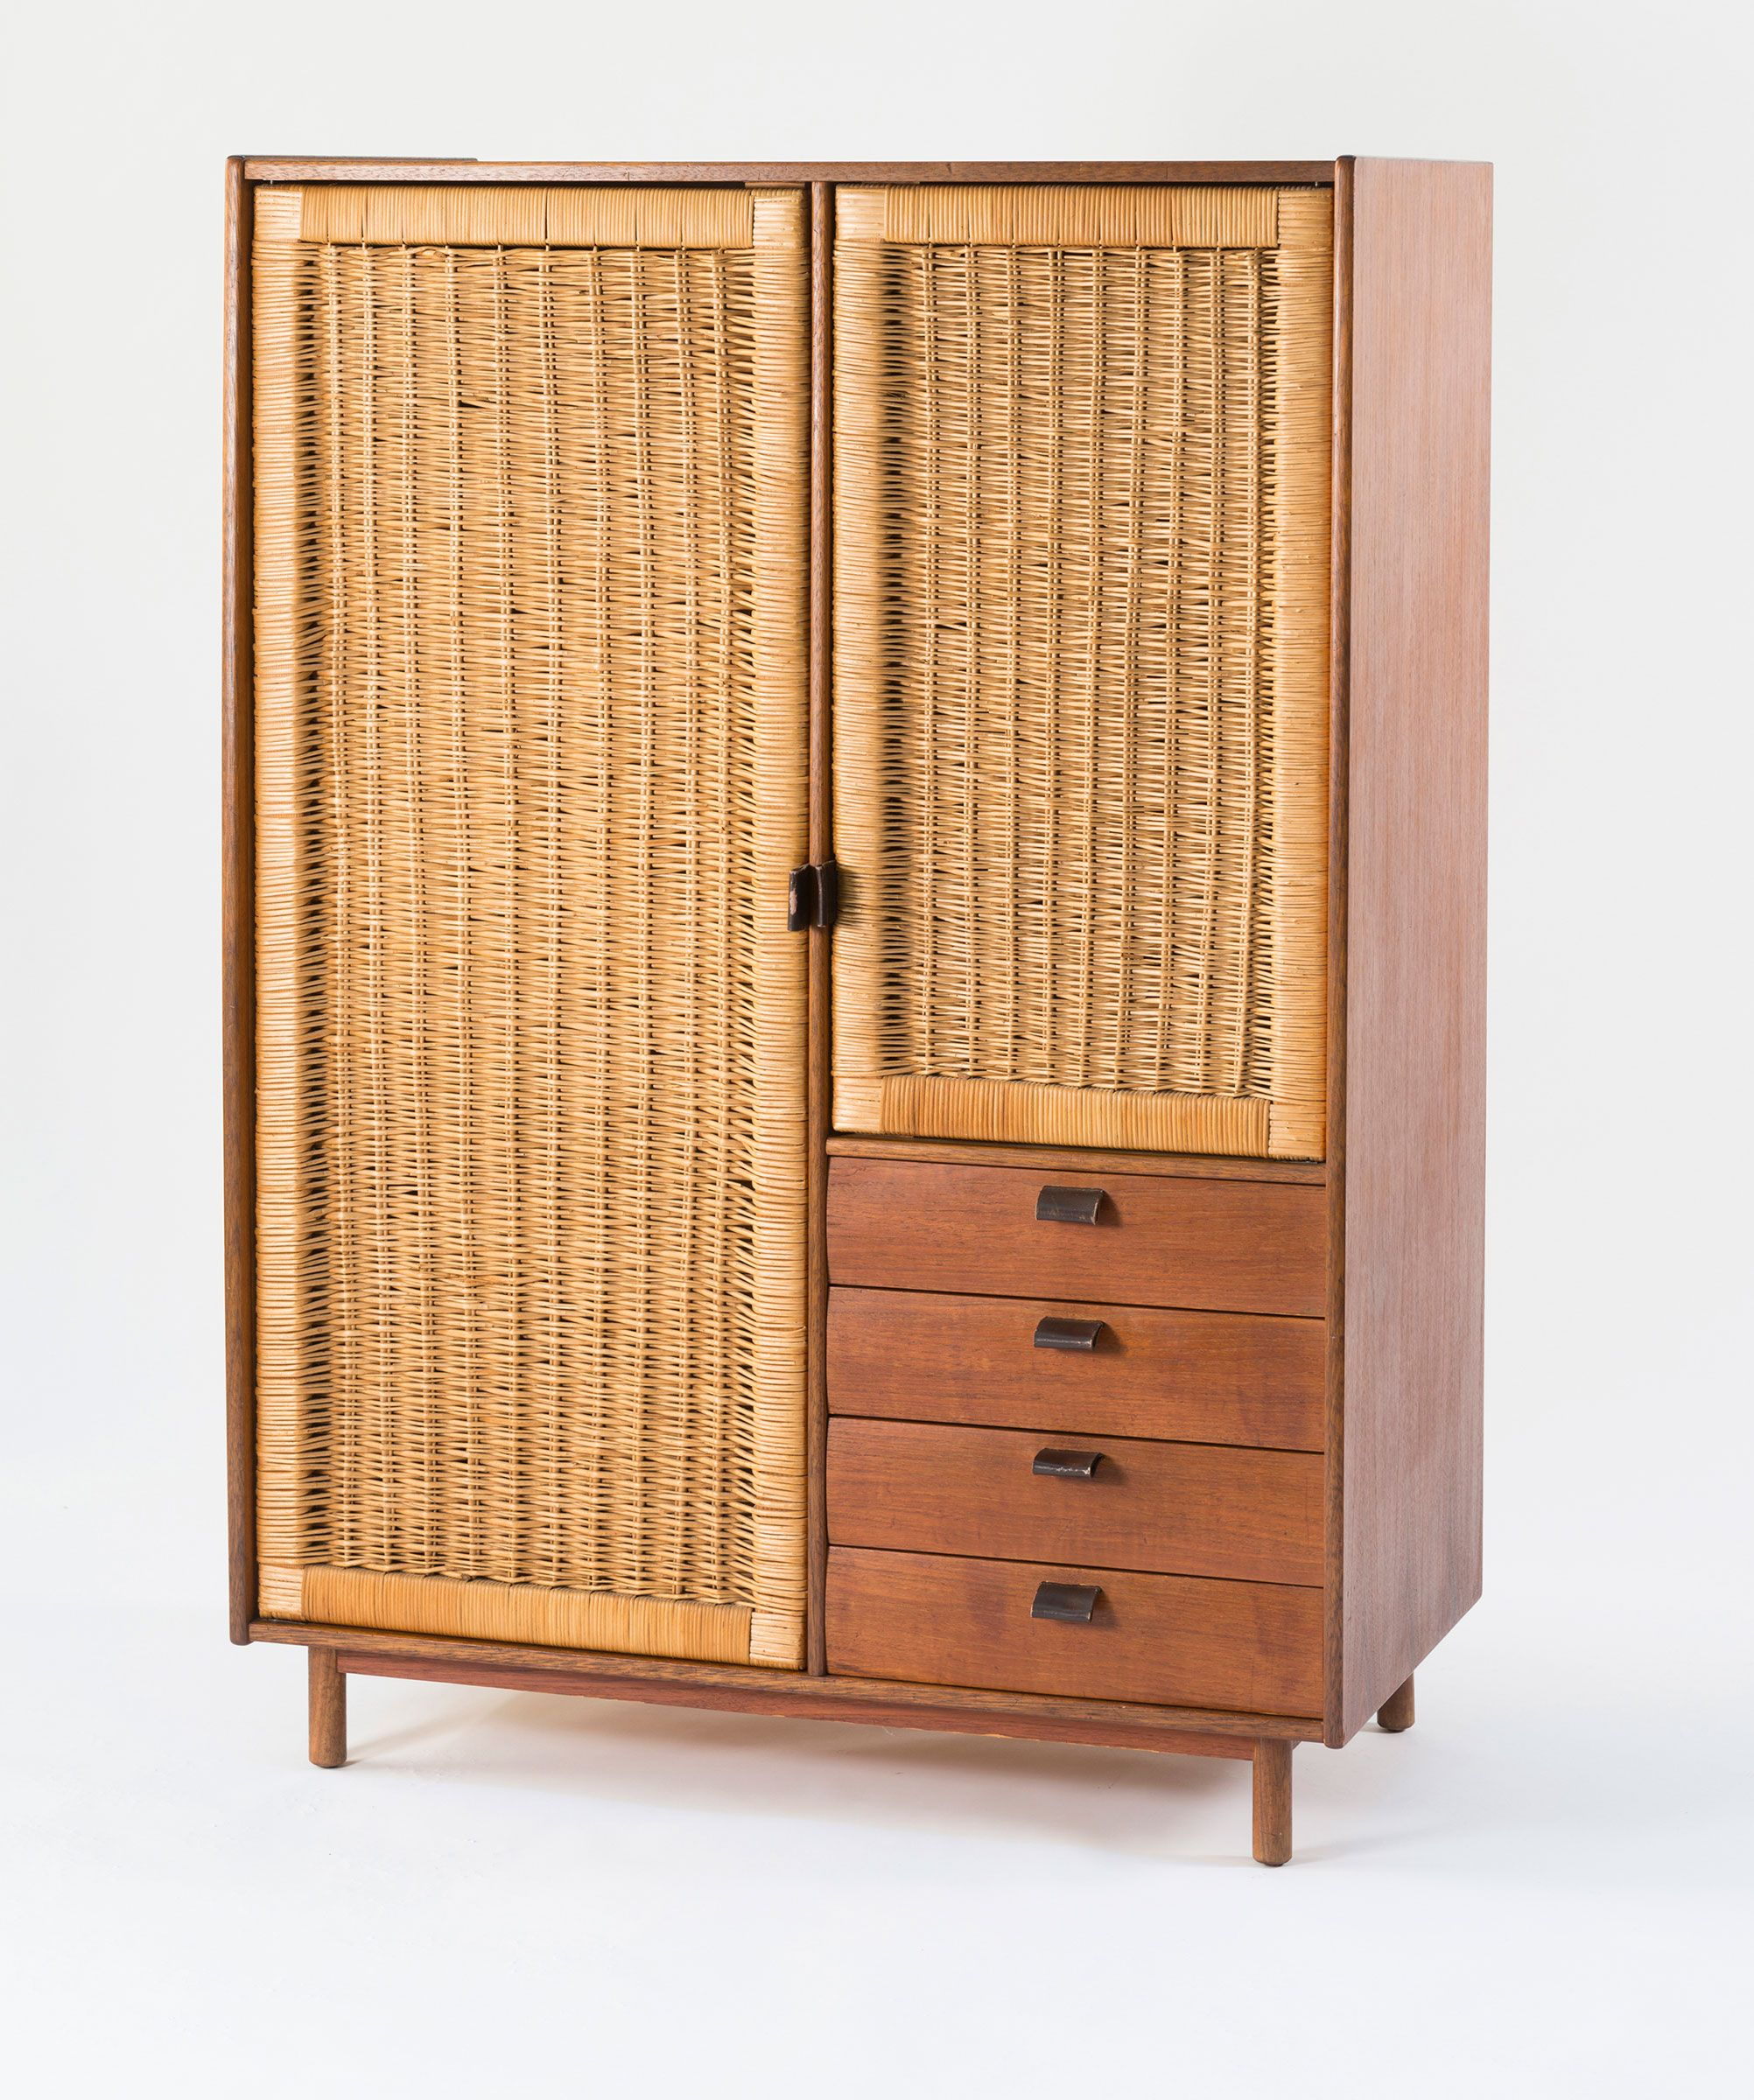 Sebastian Muggenthaler Teak And Rattan Wardrobe 1960s Einrichtungsstil Haus Deko Mobeldesign